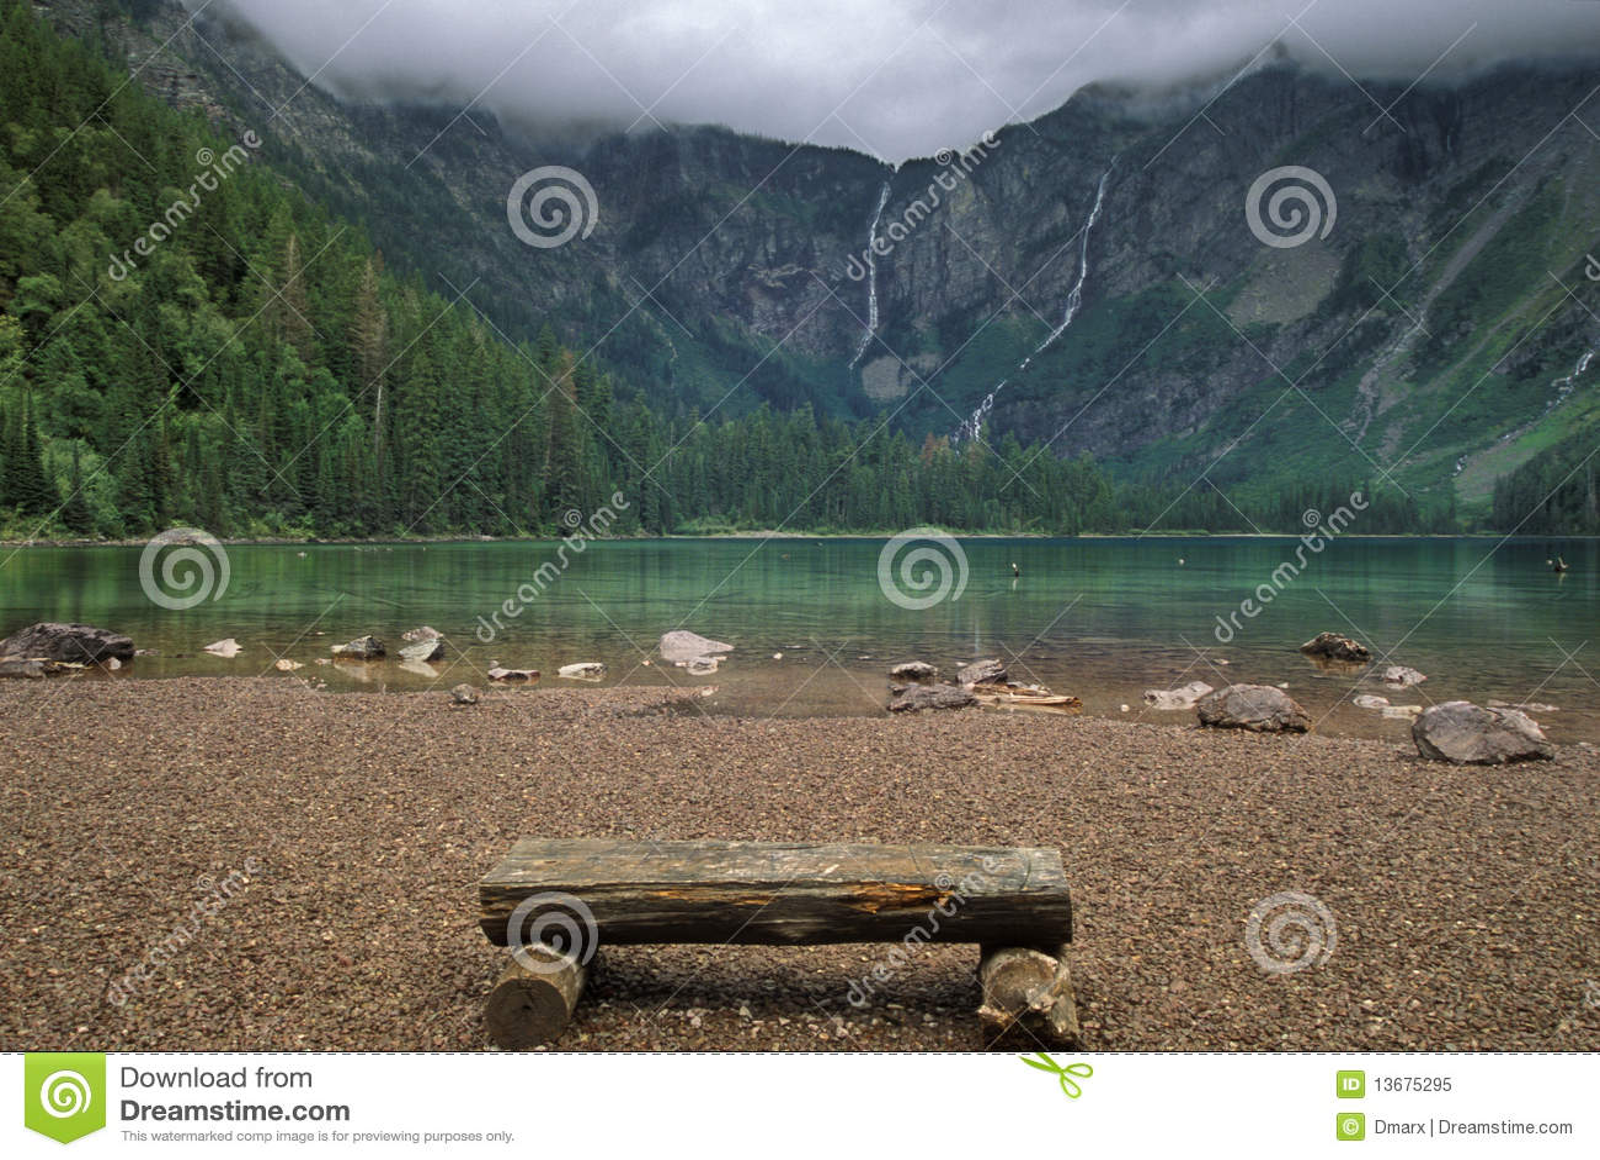 Wooden Bench Near A Mountain Lake Royalty Free Stock Photo